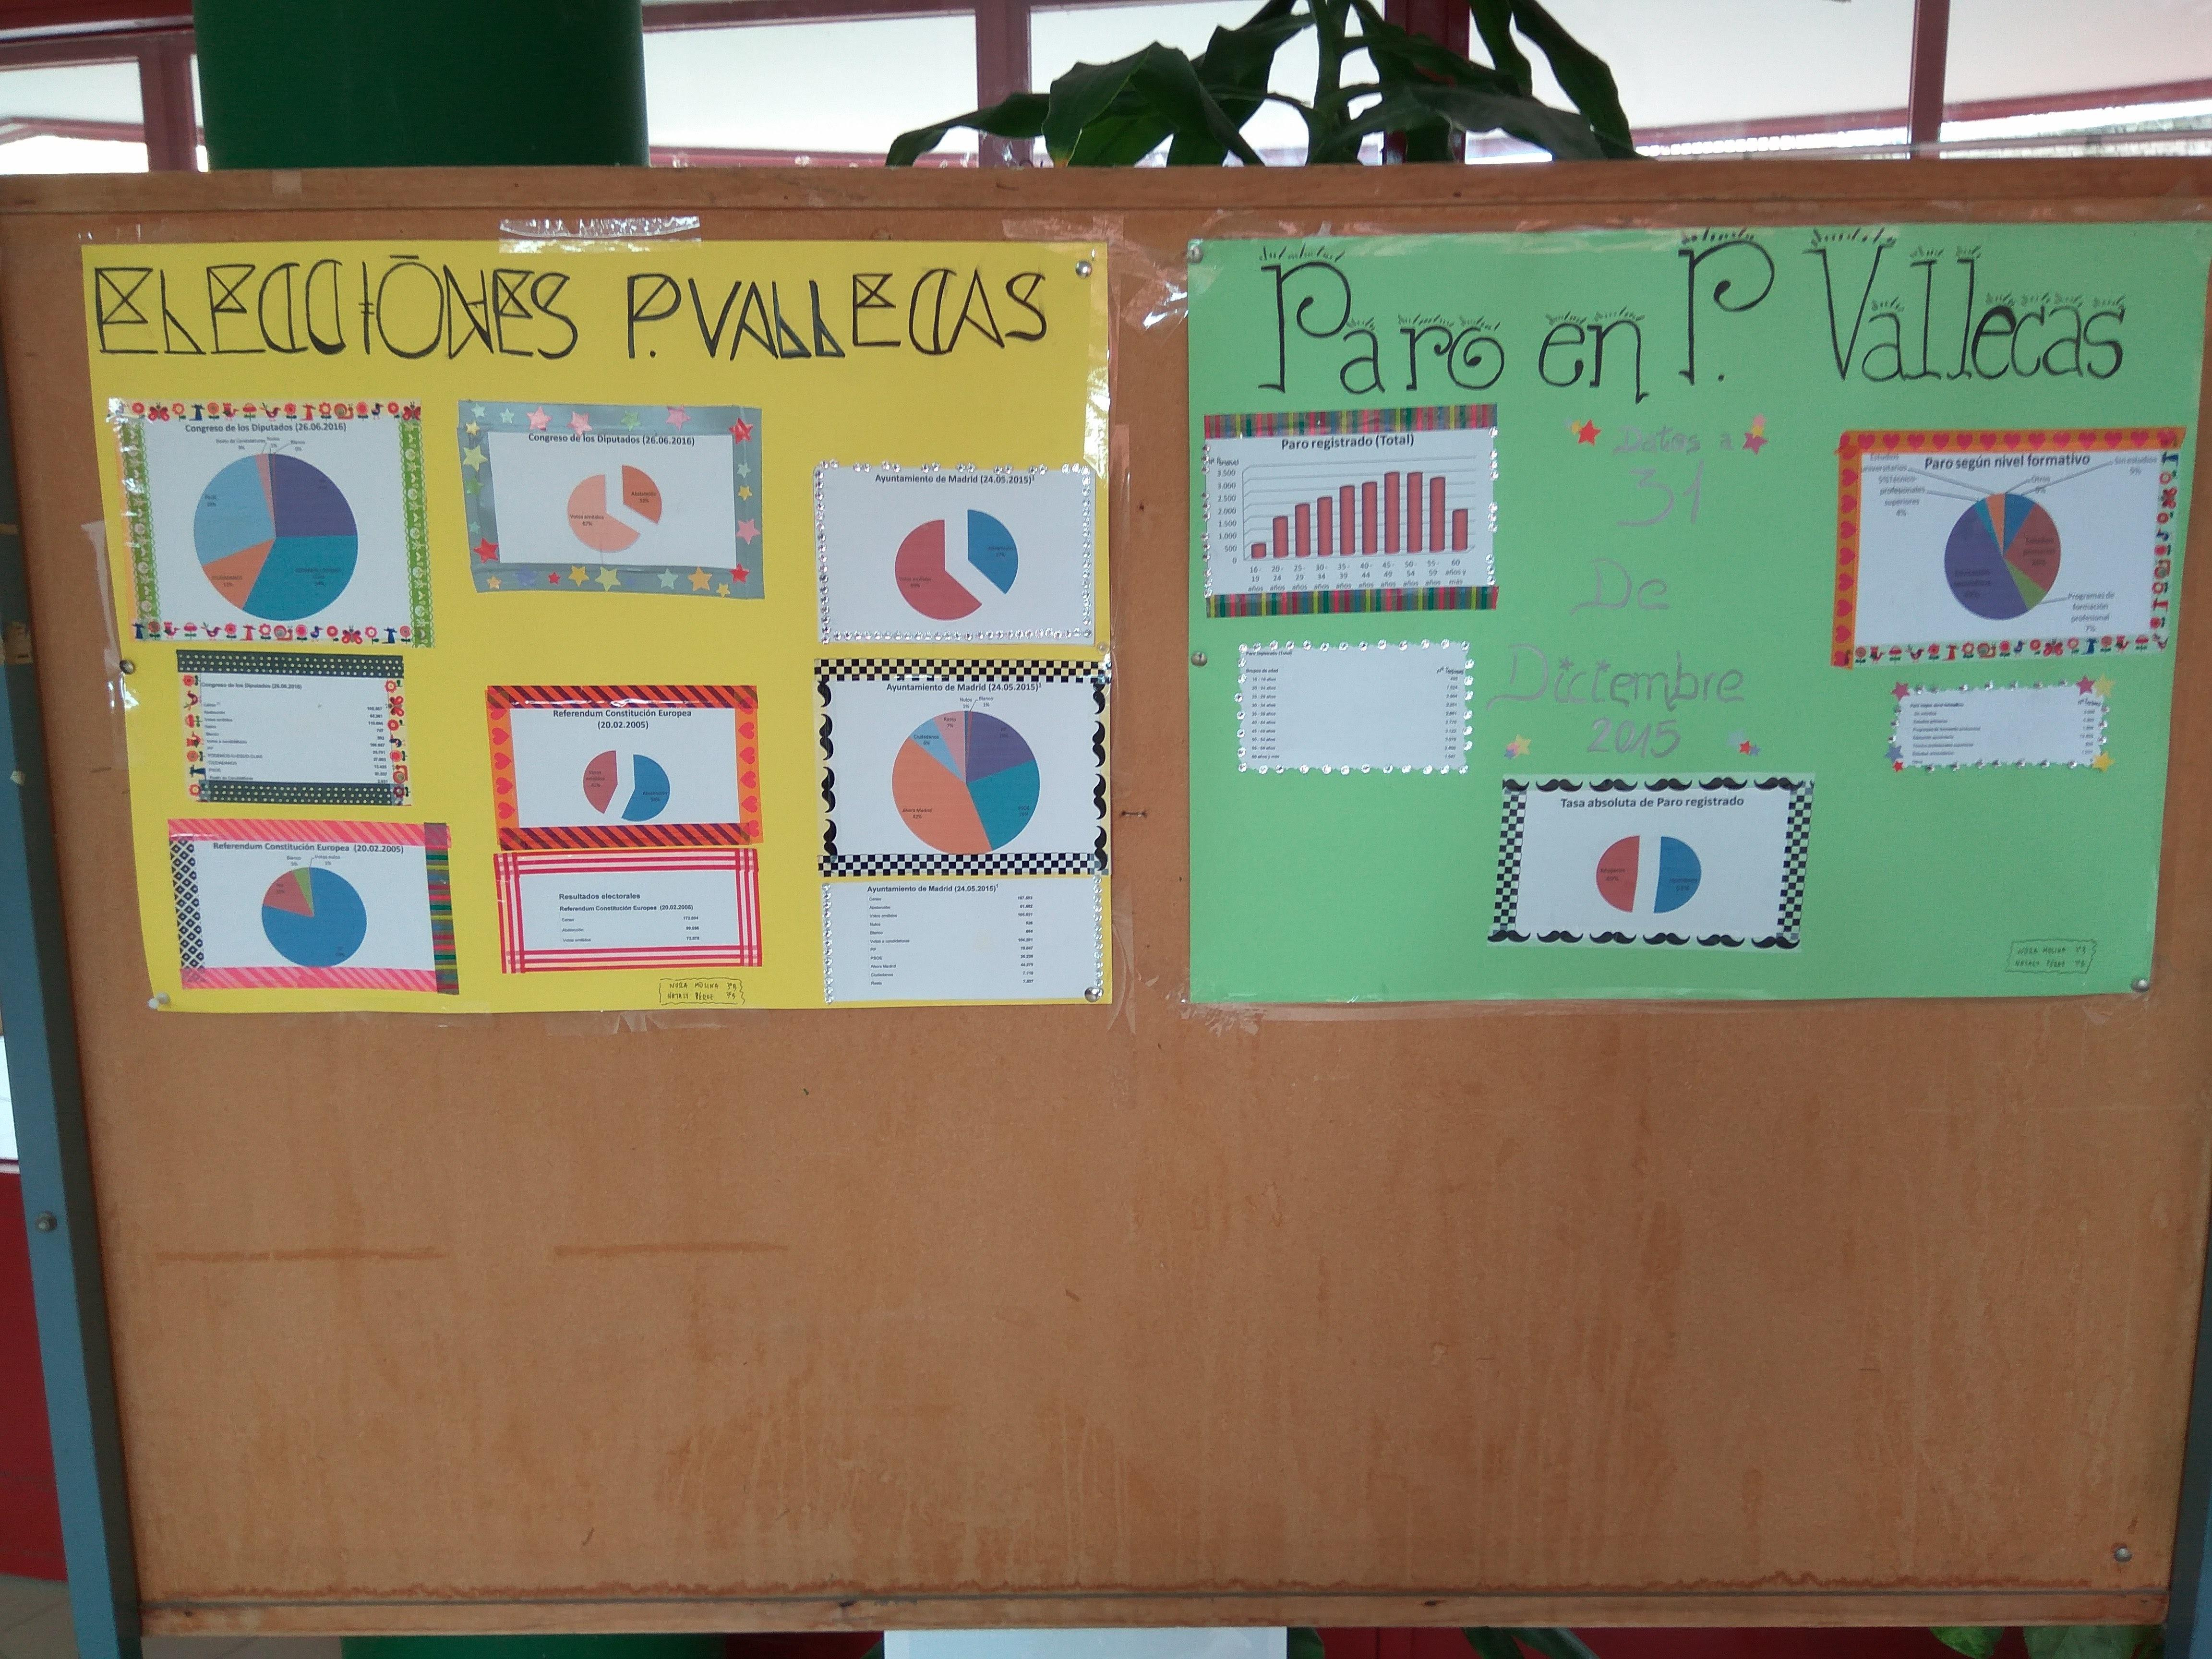 semana proyectos vallecas (9)